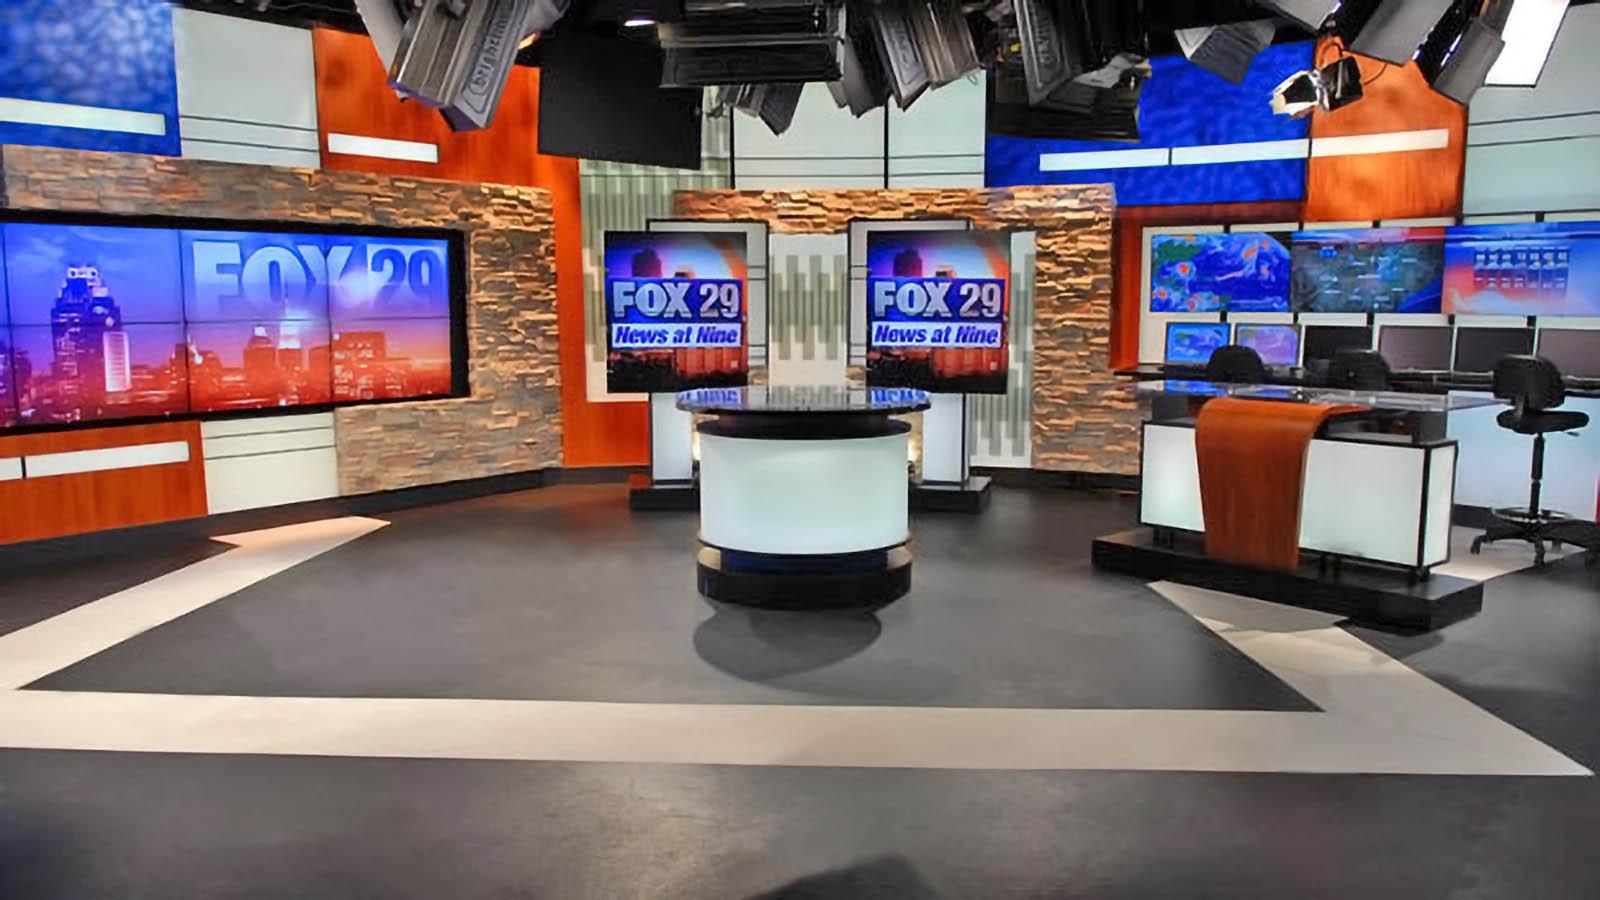 Fox 29 News San Antonio live streaming studio